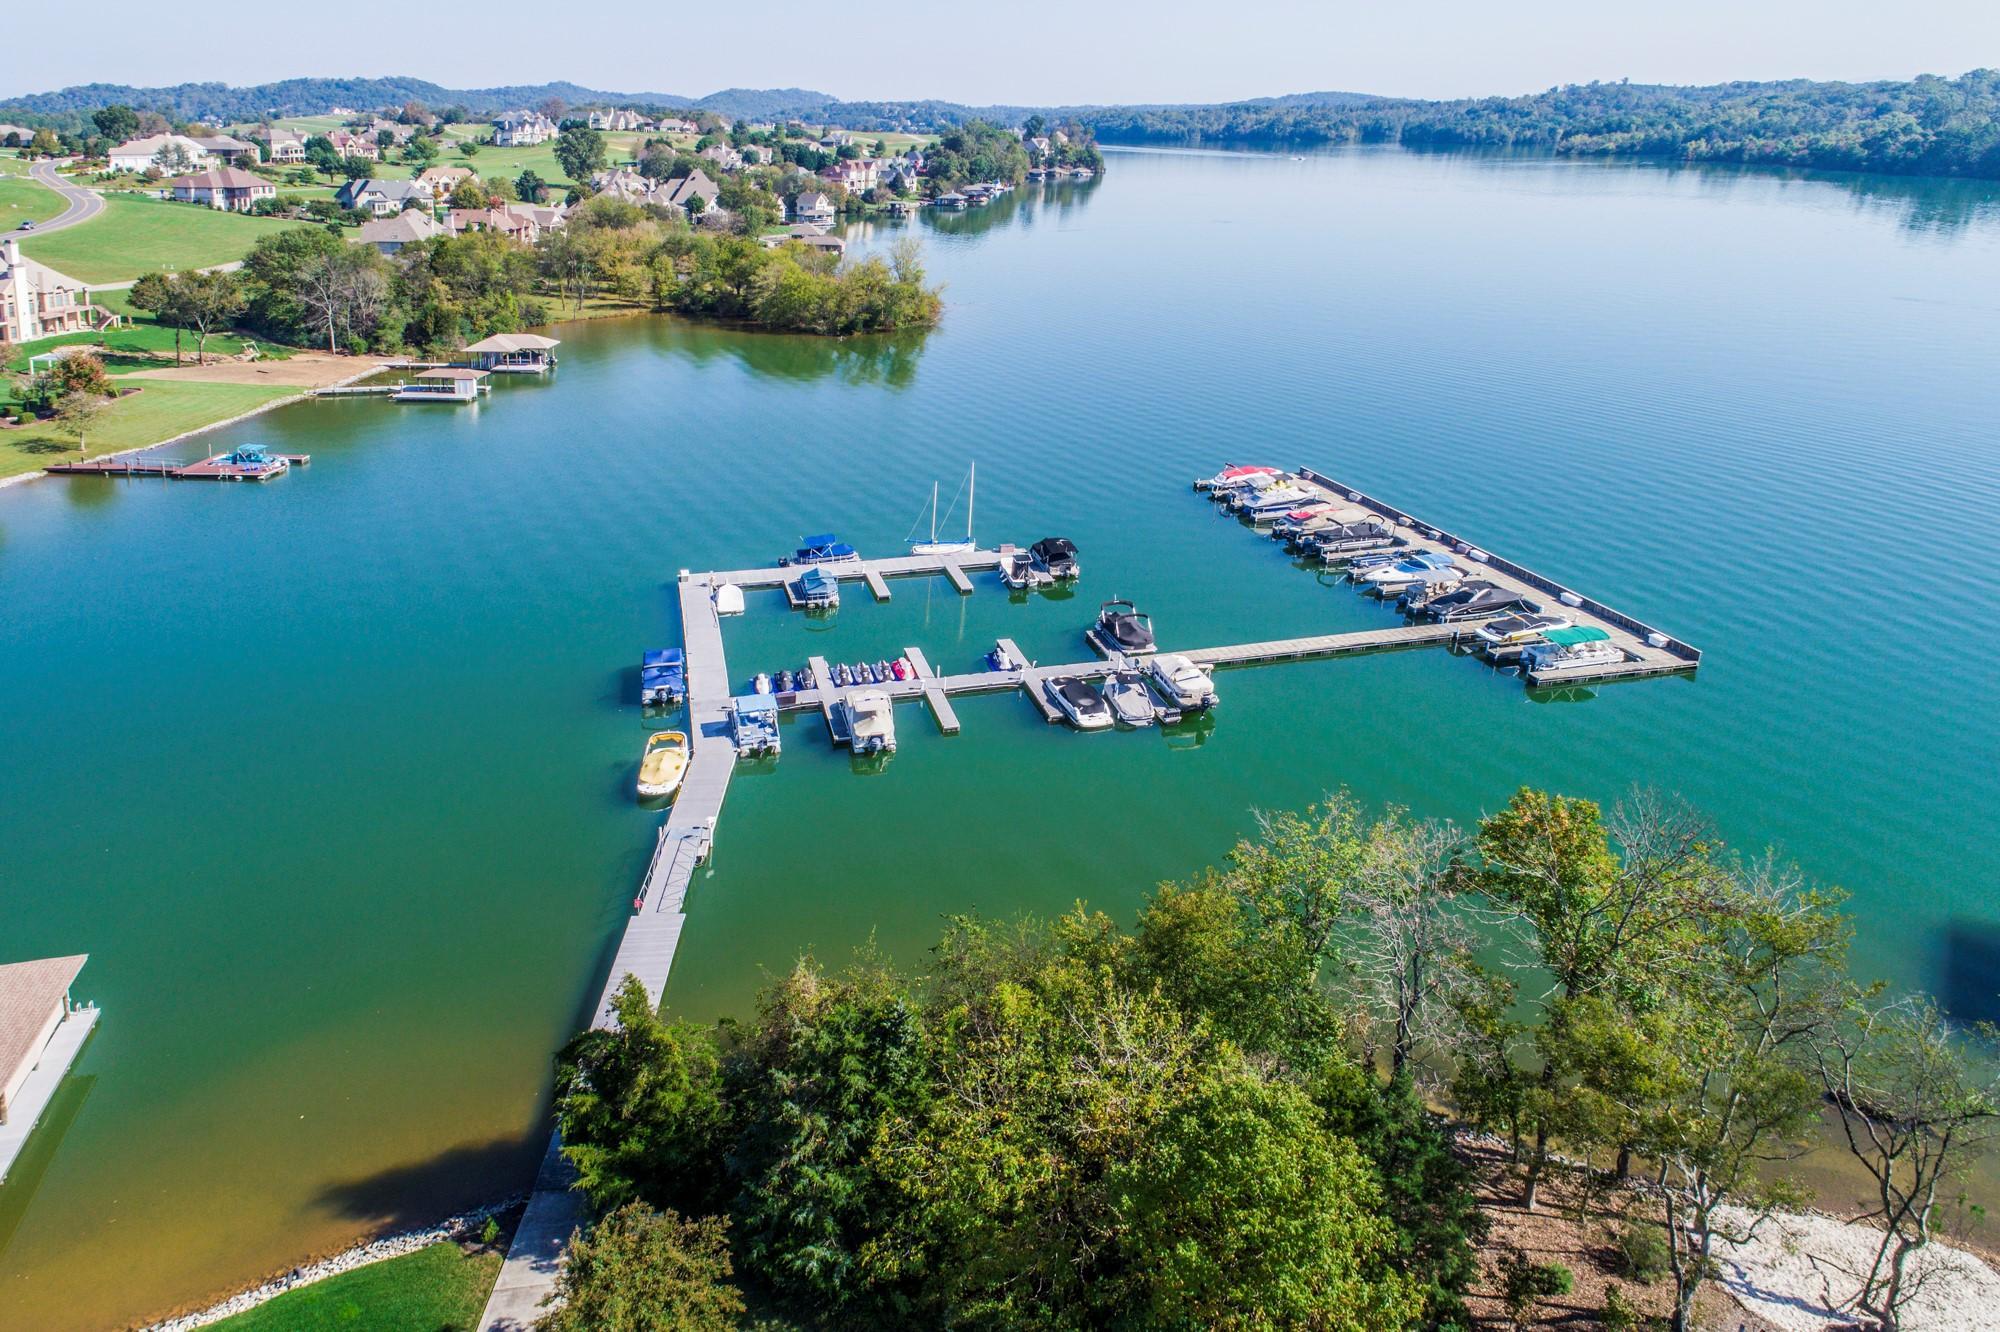 Rarity Bay Community Docks